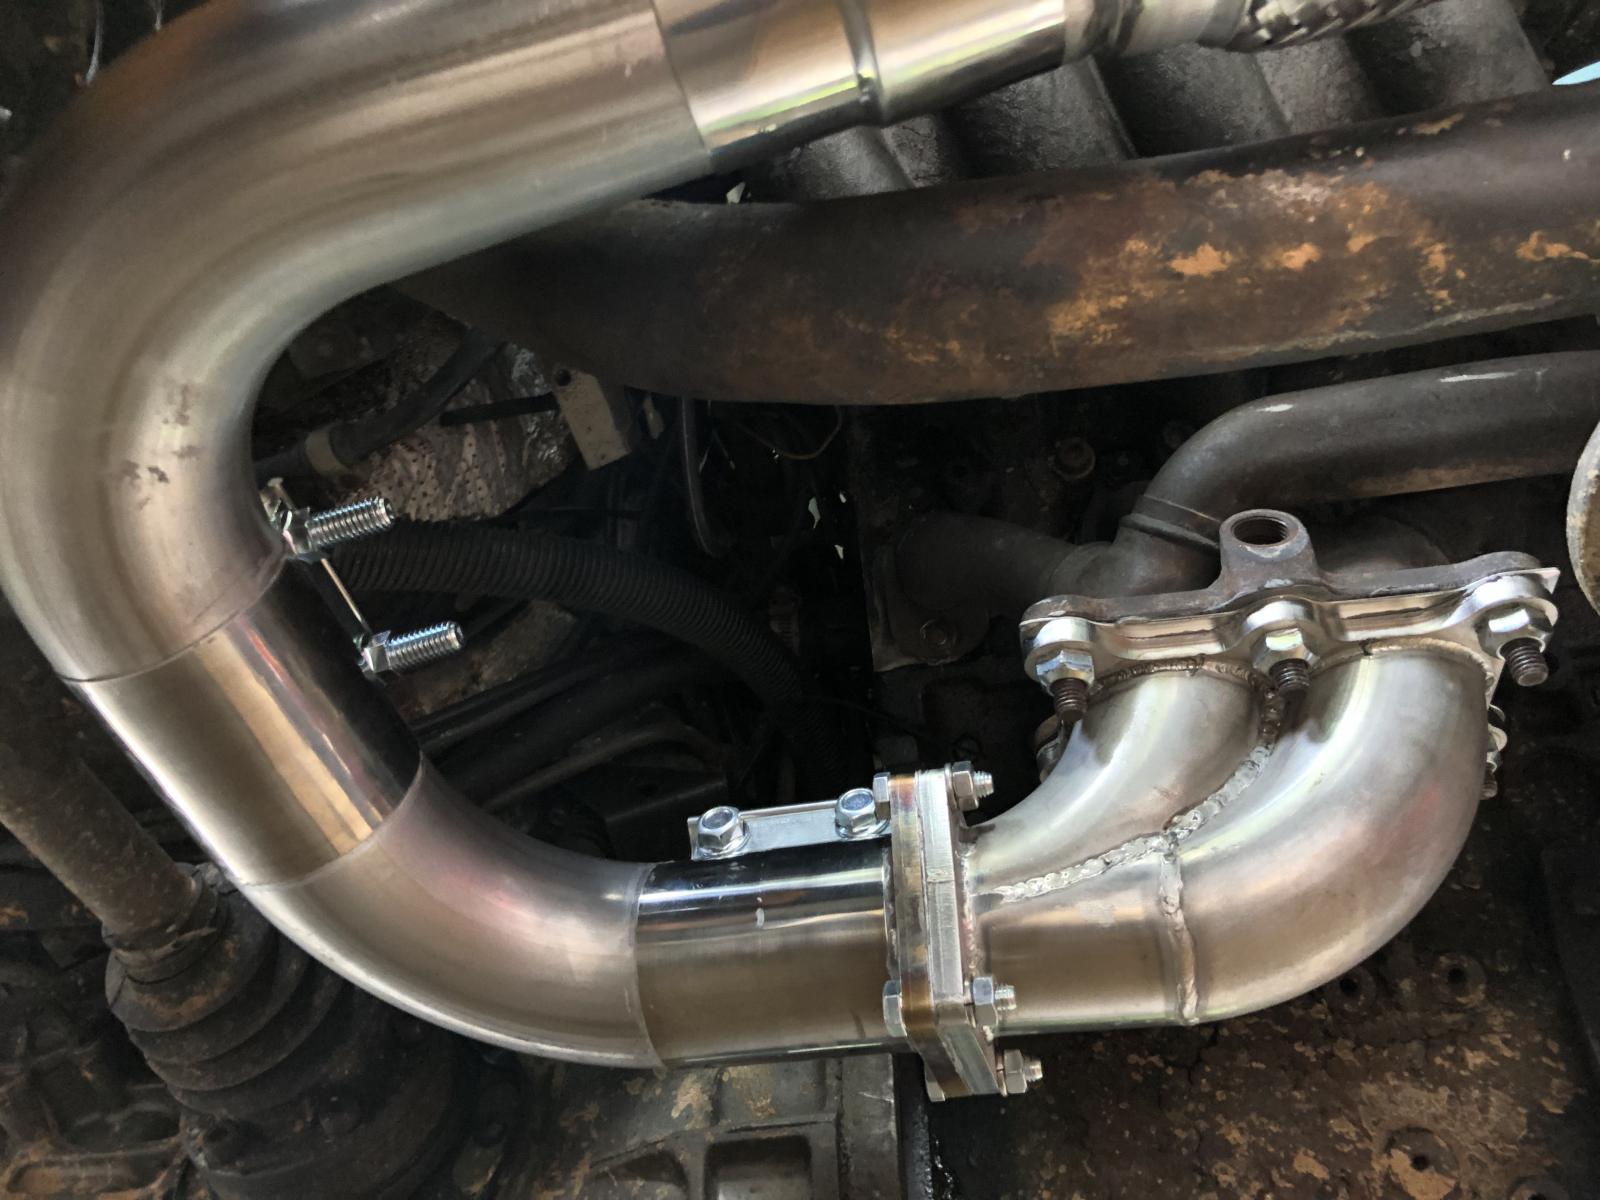 Thesamba Com Vanagon View Topic 2 0 Aba Exhaust With Aeg Manifold